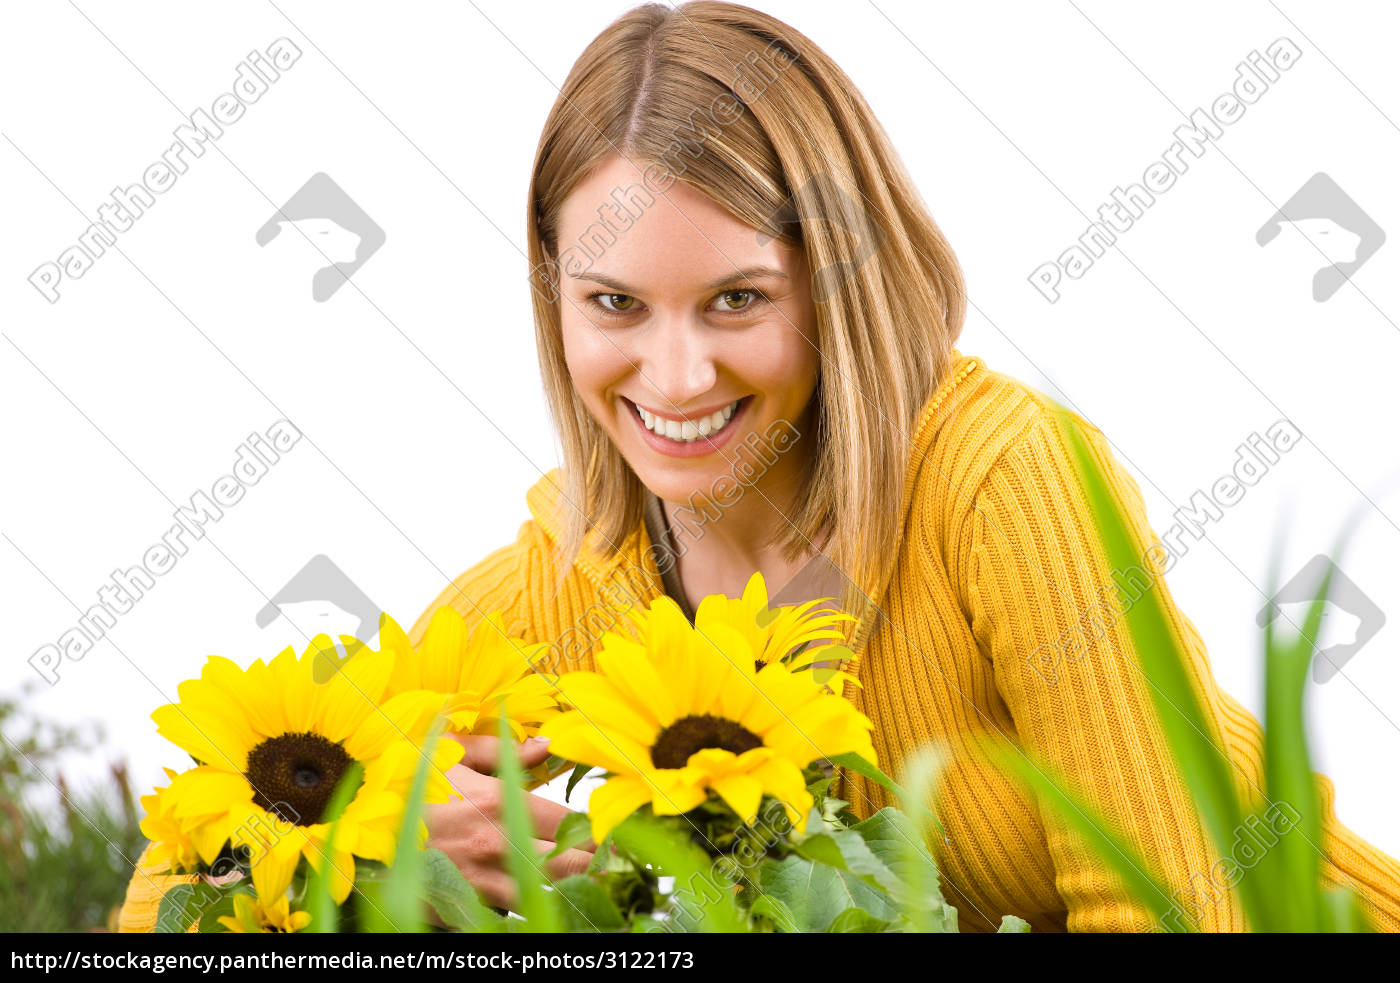 gardening, -, portrait, of, smiling, woman - 3122173